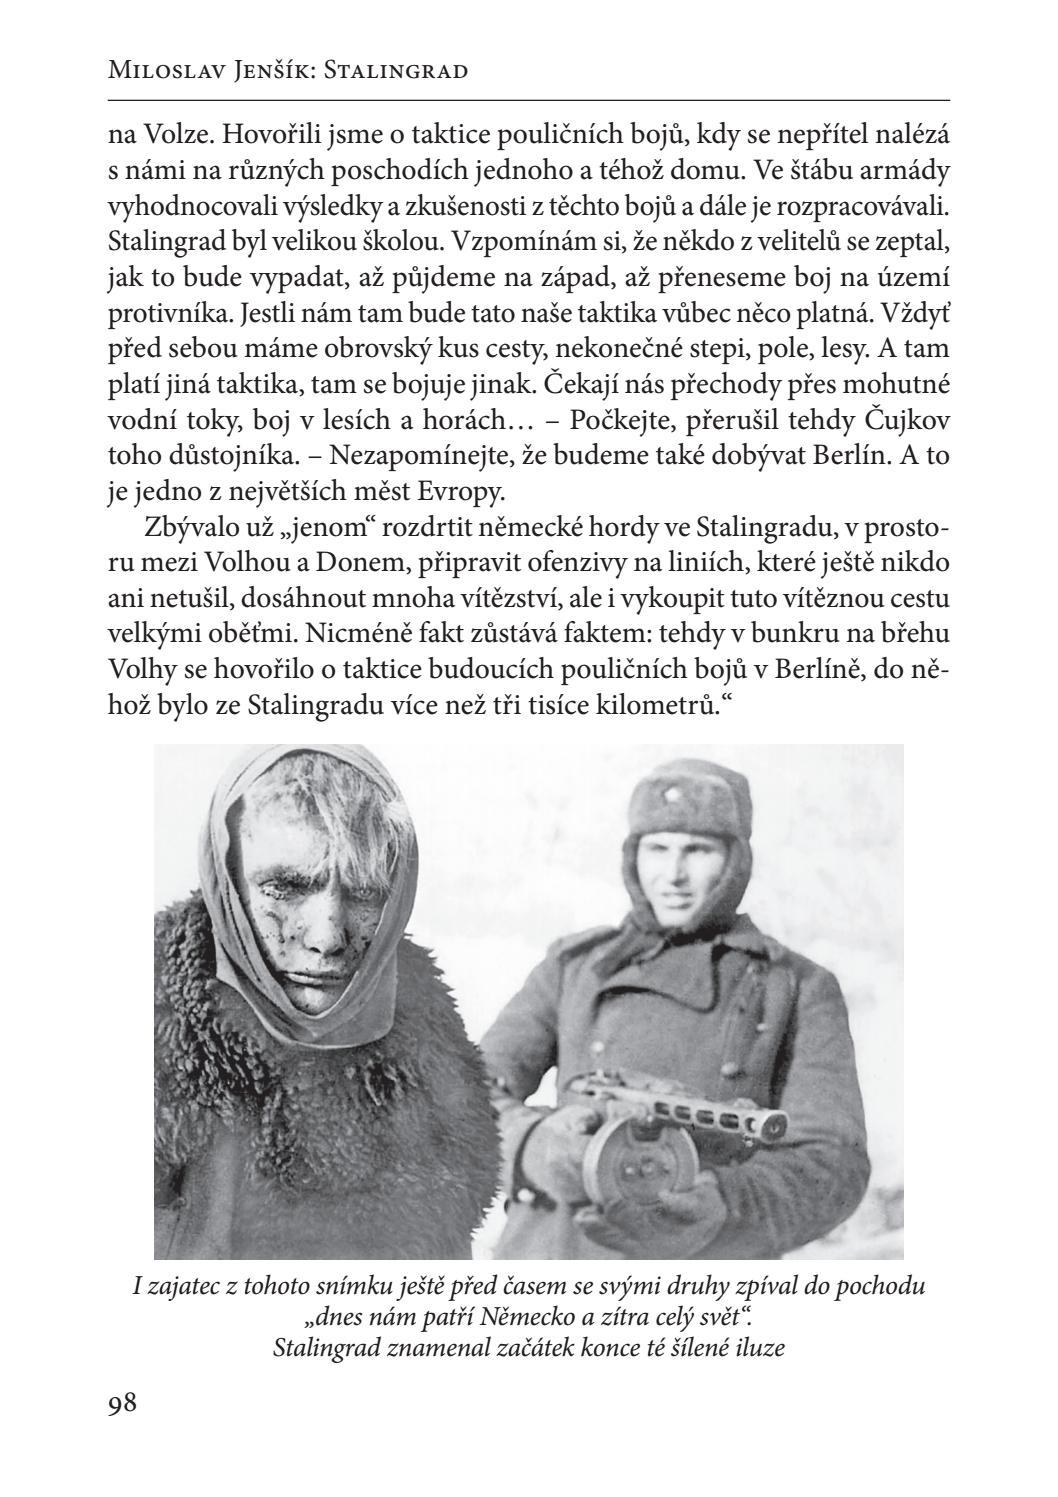 Stalingrad (Ukázka, strana 99) by Kosmas-CZ - issuu